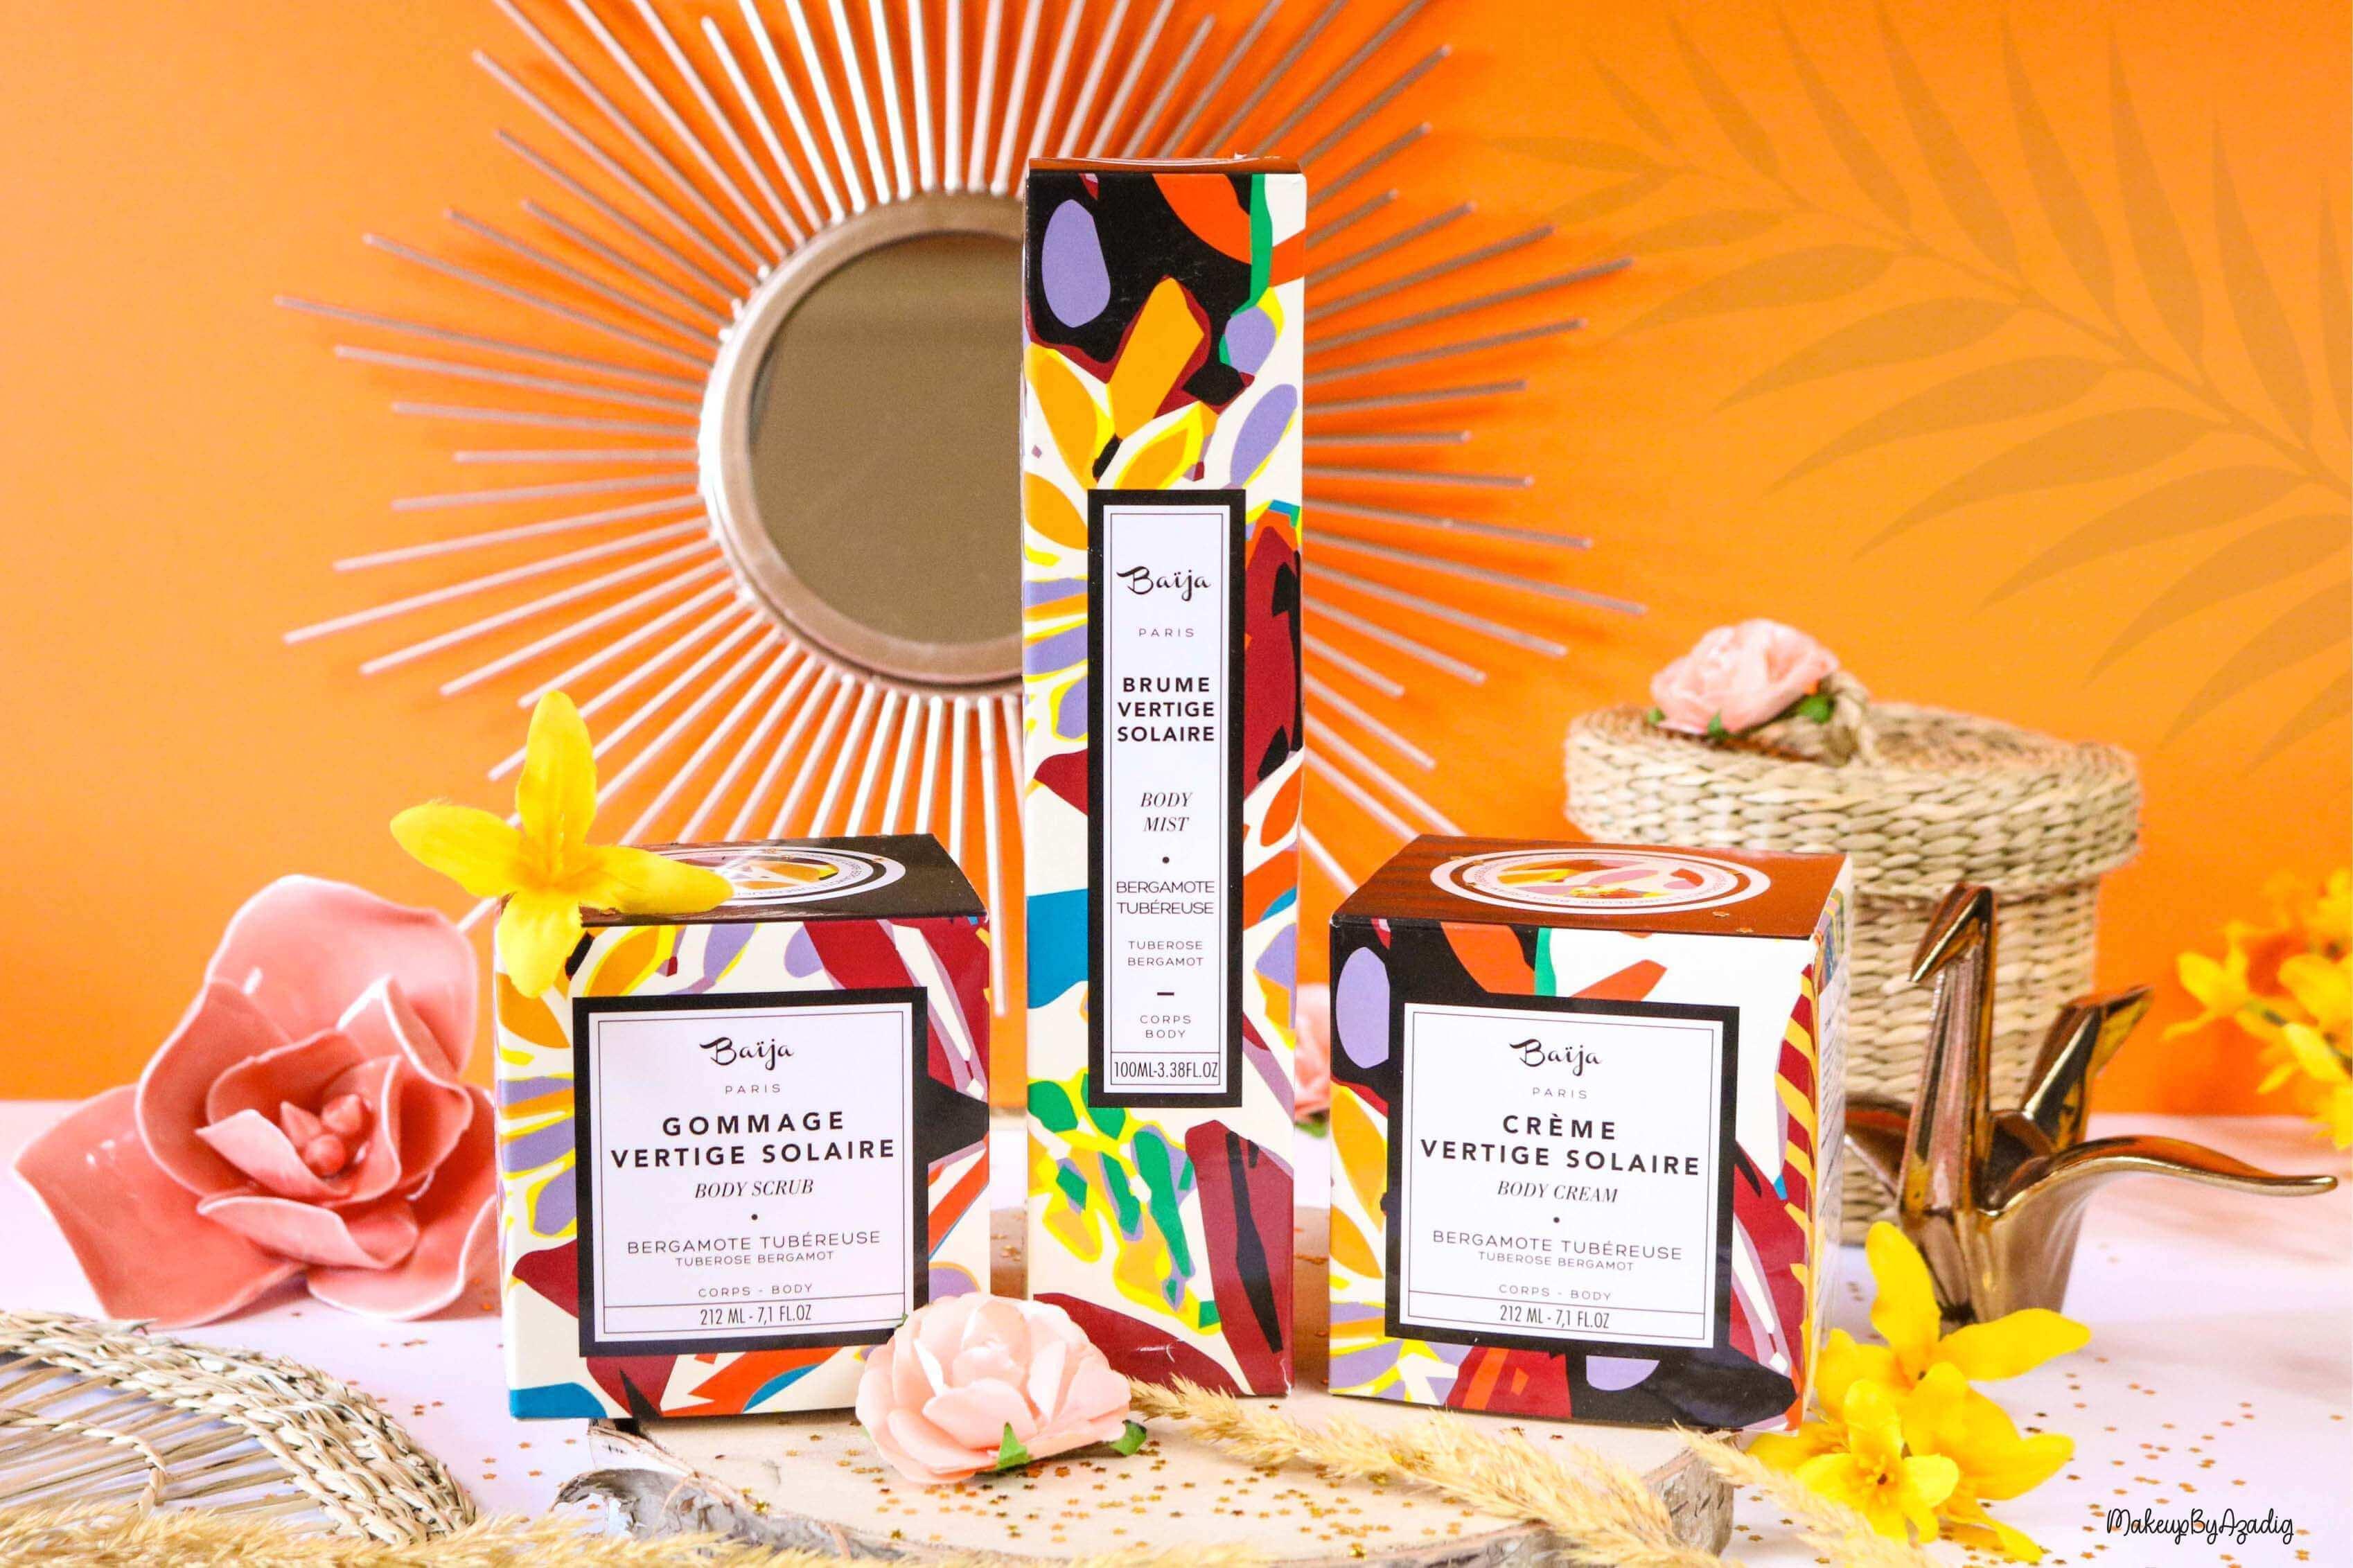 nouveaute-soin-baija-vertige-solaire-sephora-promo-code-gommage-creme-corps-brume-avis-prix-makeupbyazadig-qualite-soleil